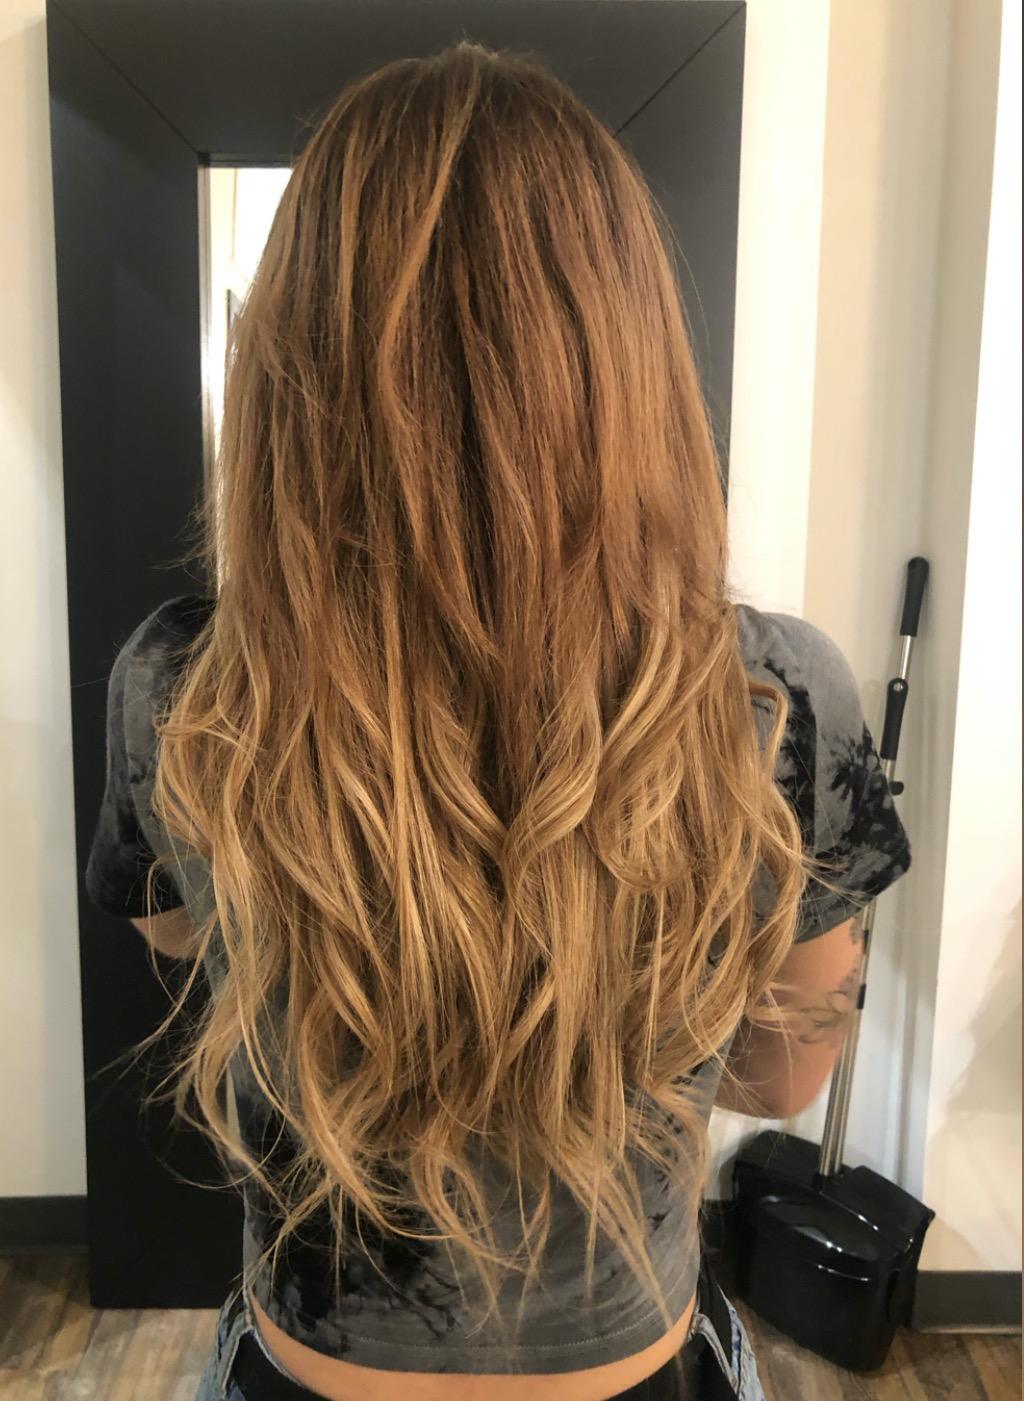 Hair Extensions - MML on Johnson